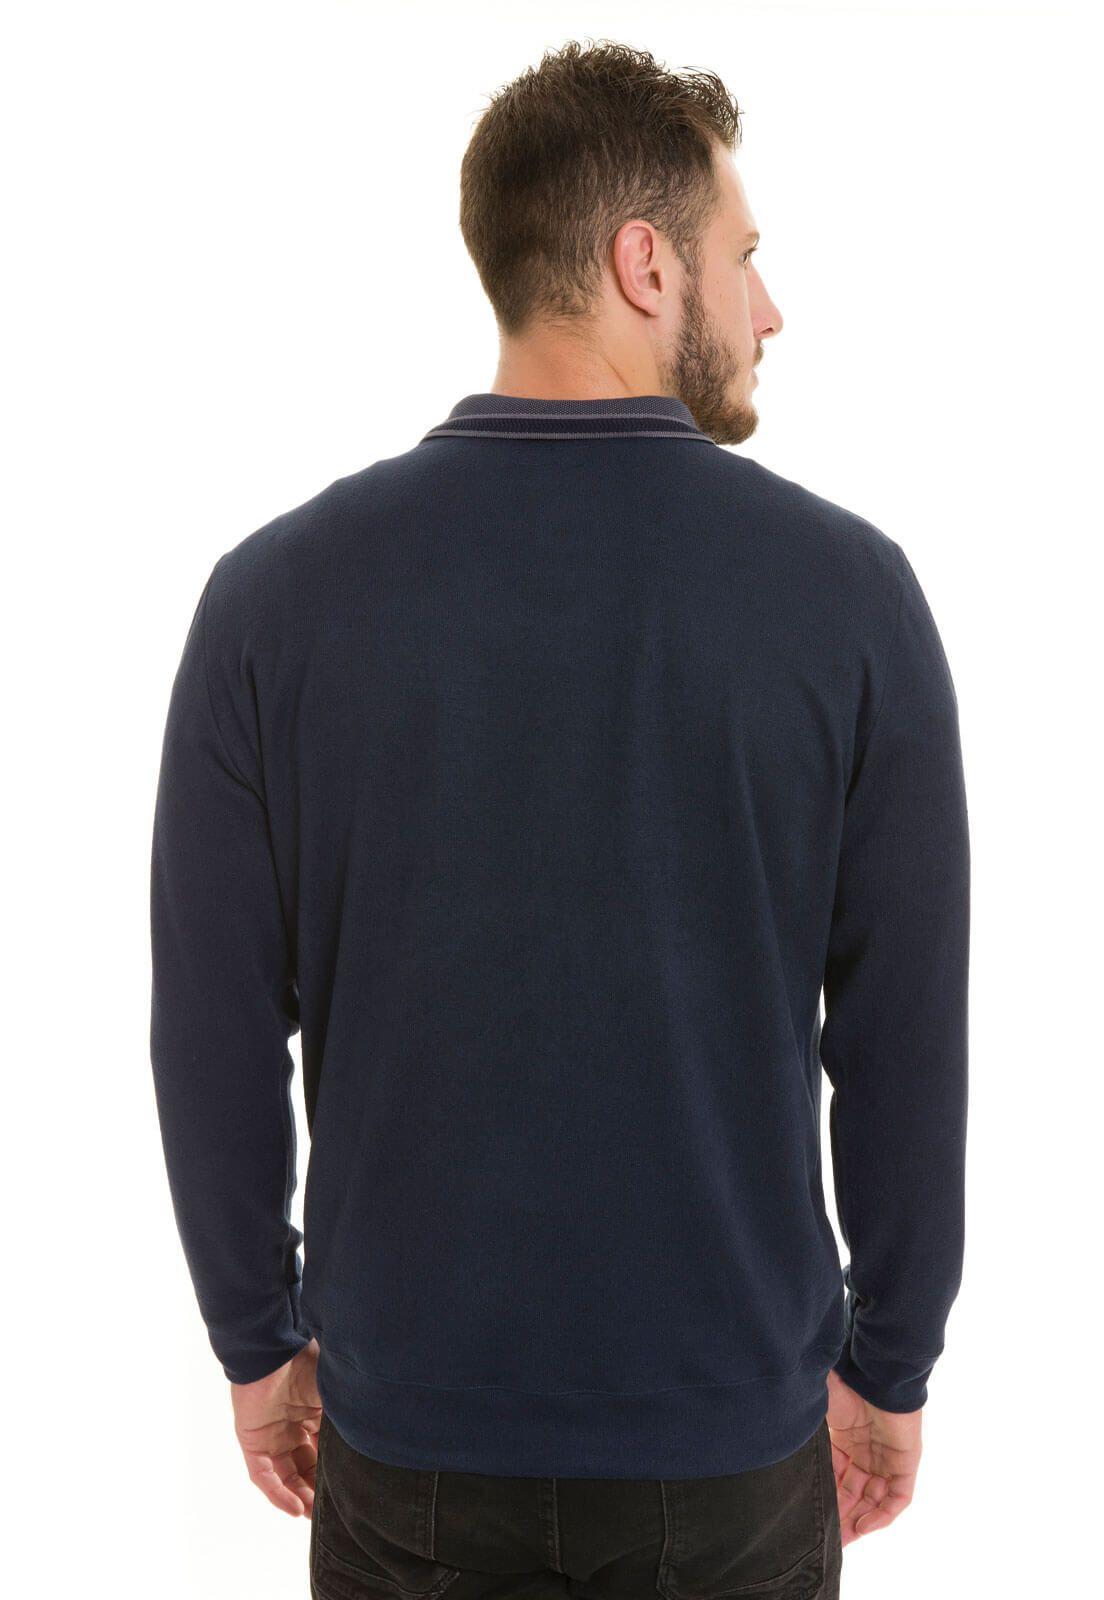 Suéter Masculino Olimpo Malha Tricot Inverno Decote V